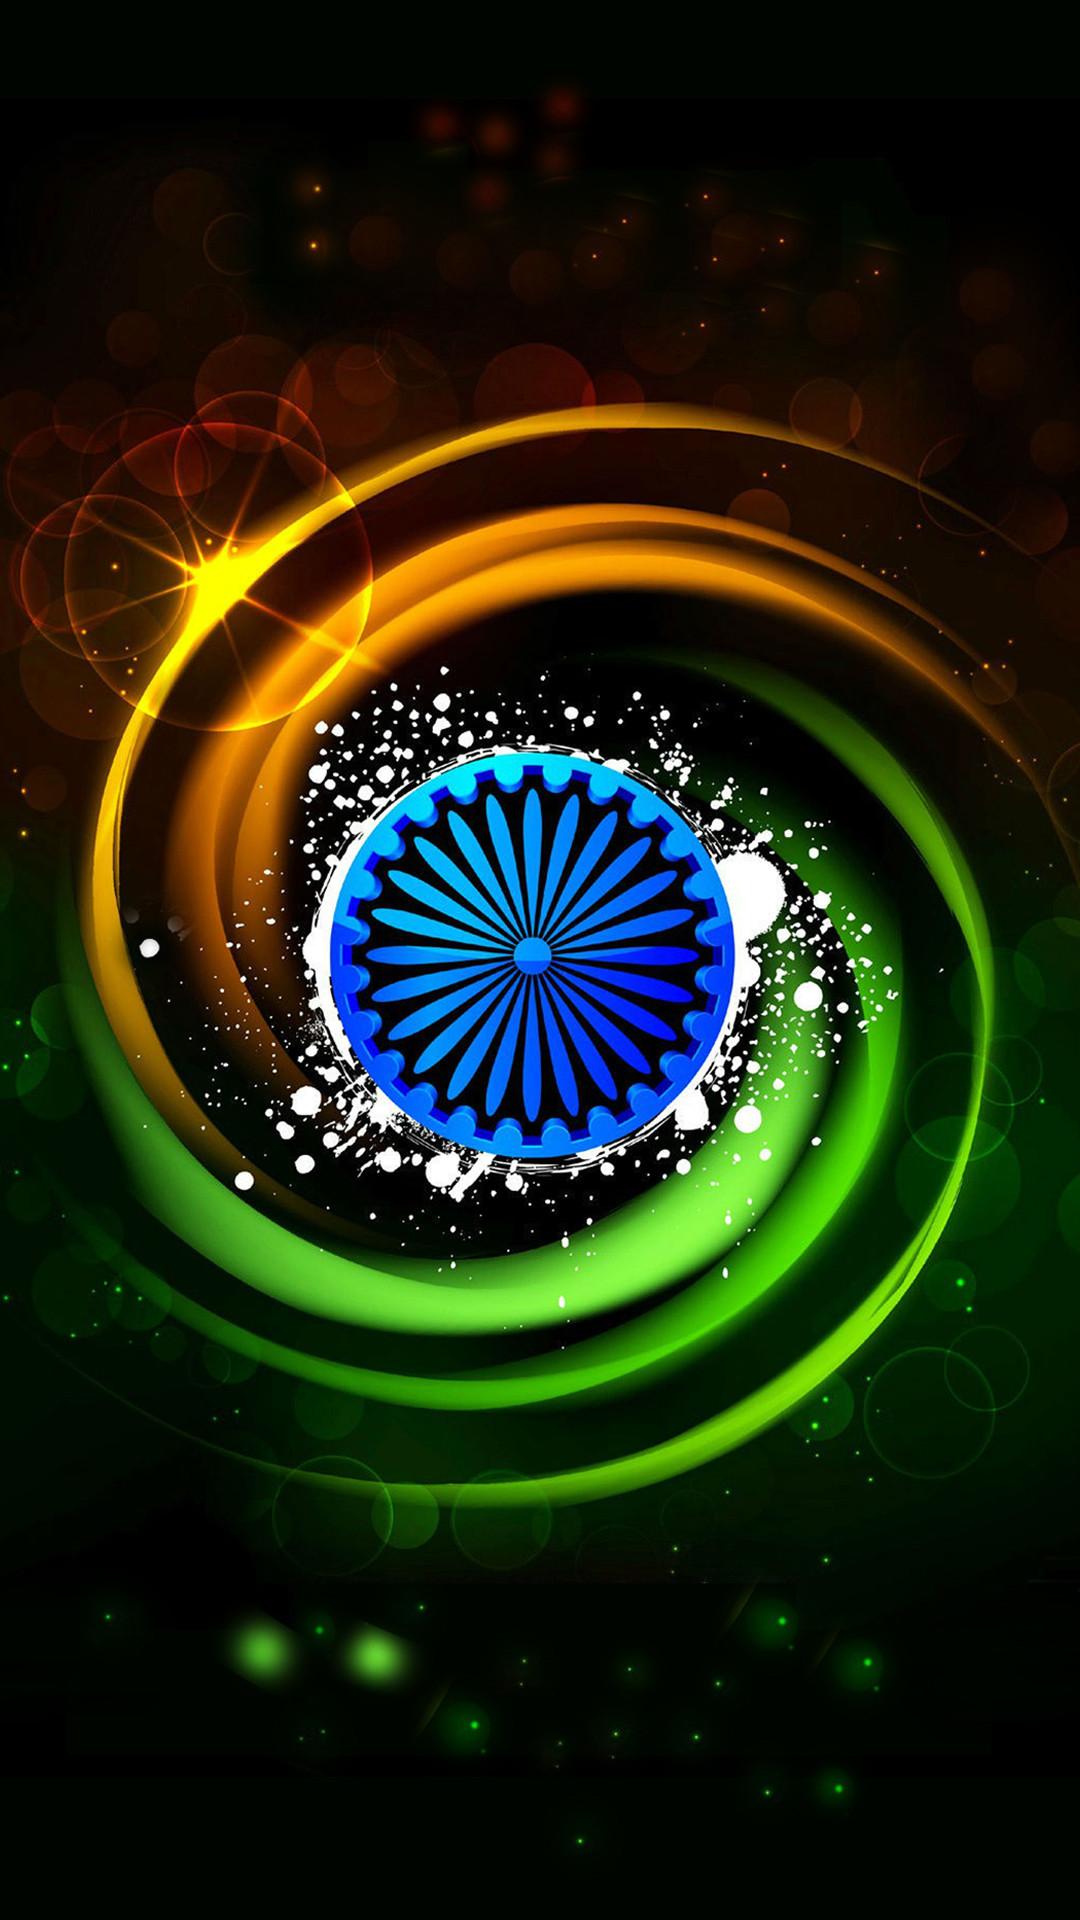 indian flag wallpaper 2018 78 images